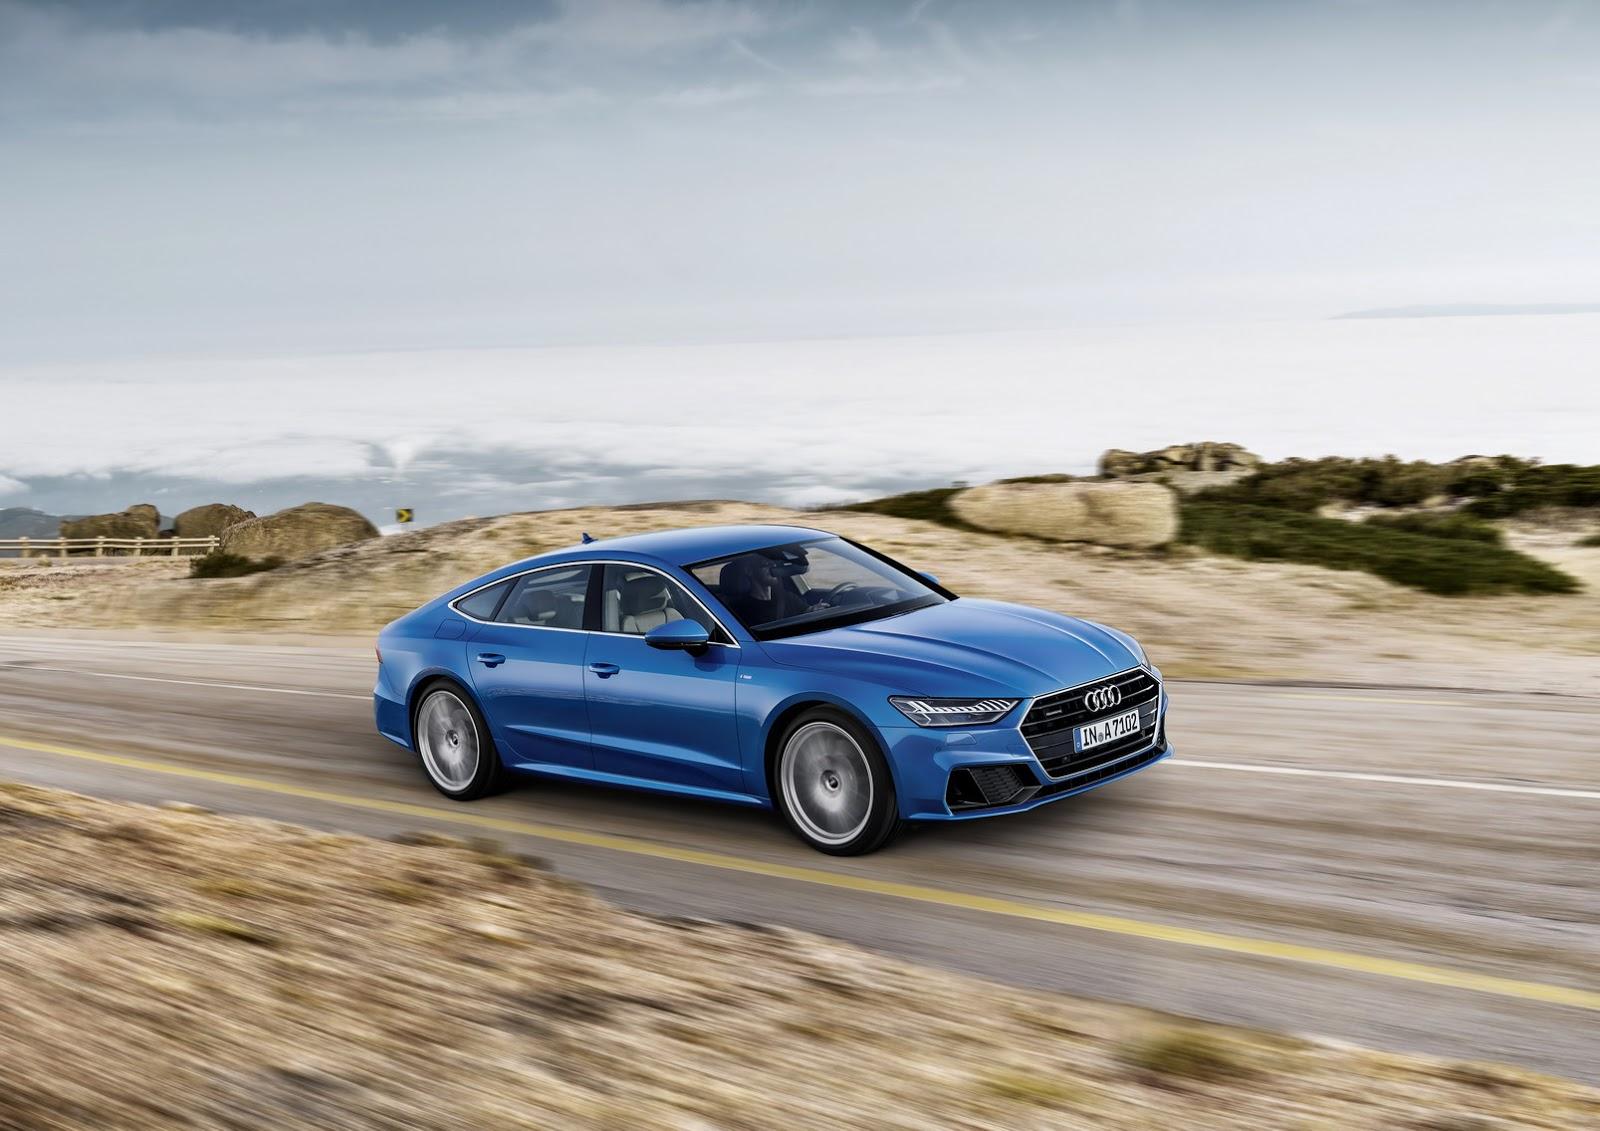 2018_Audi_A7_Sportback_0022